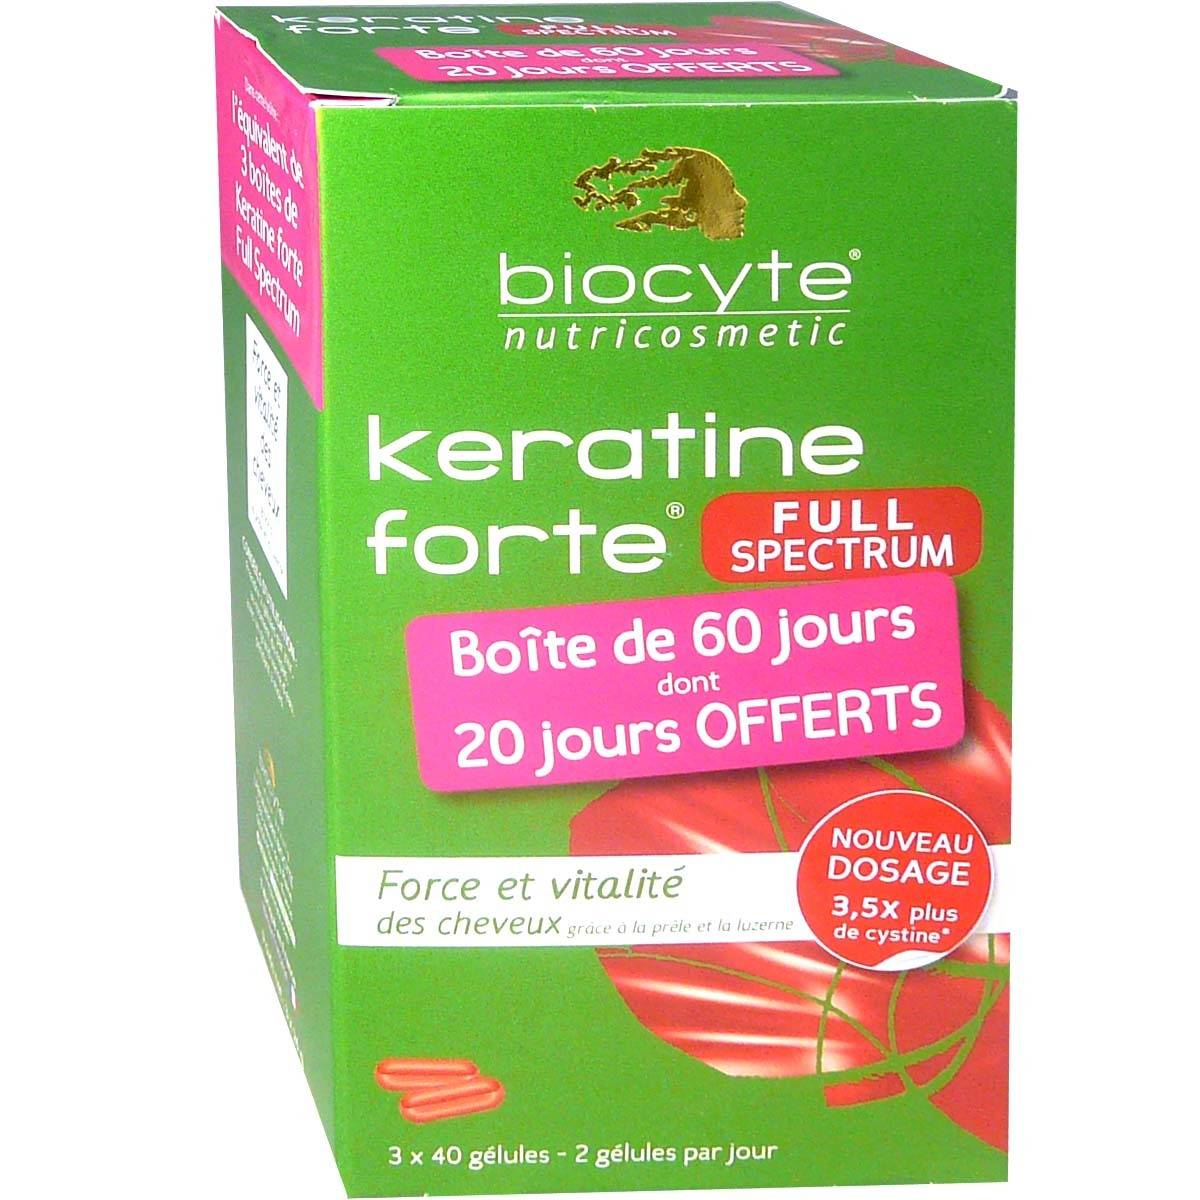 Biocyte keratine forte full spectrum 3x40 gelules